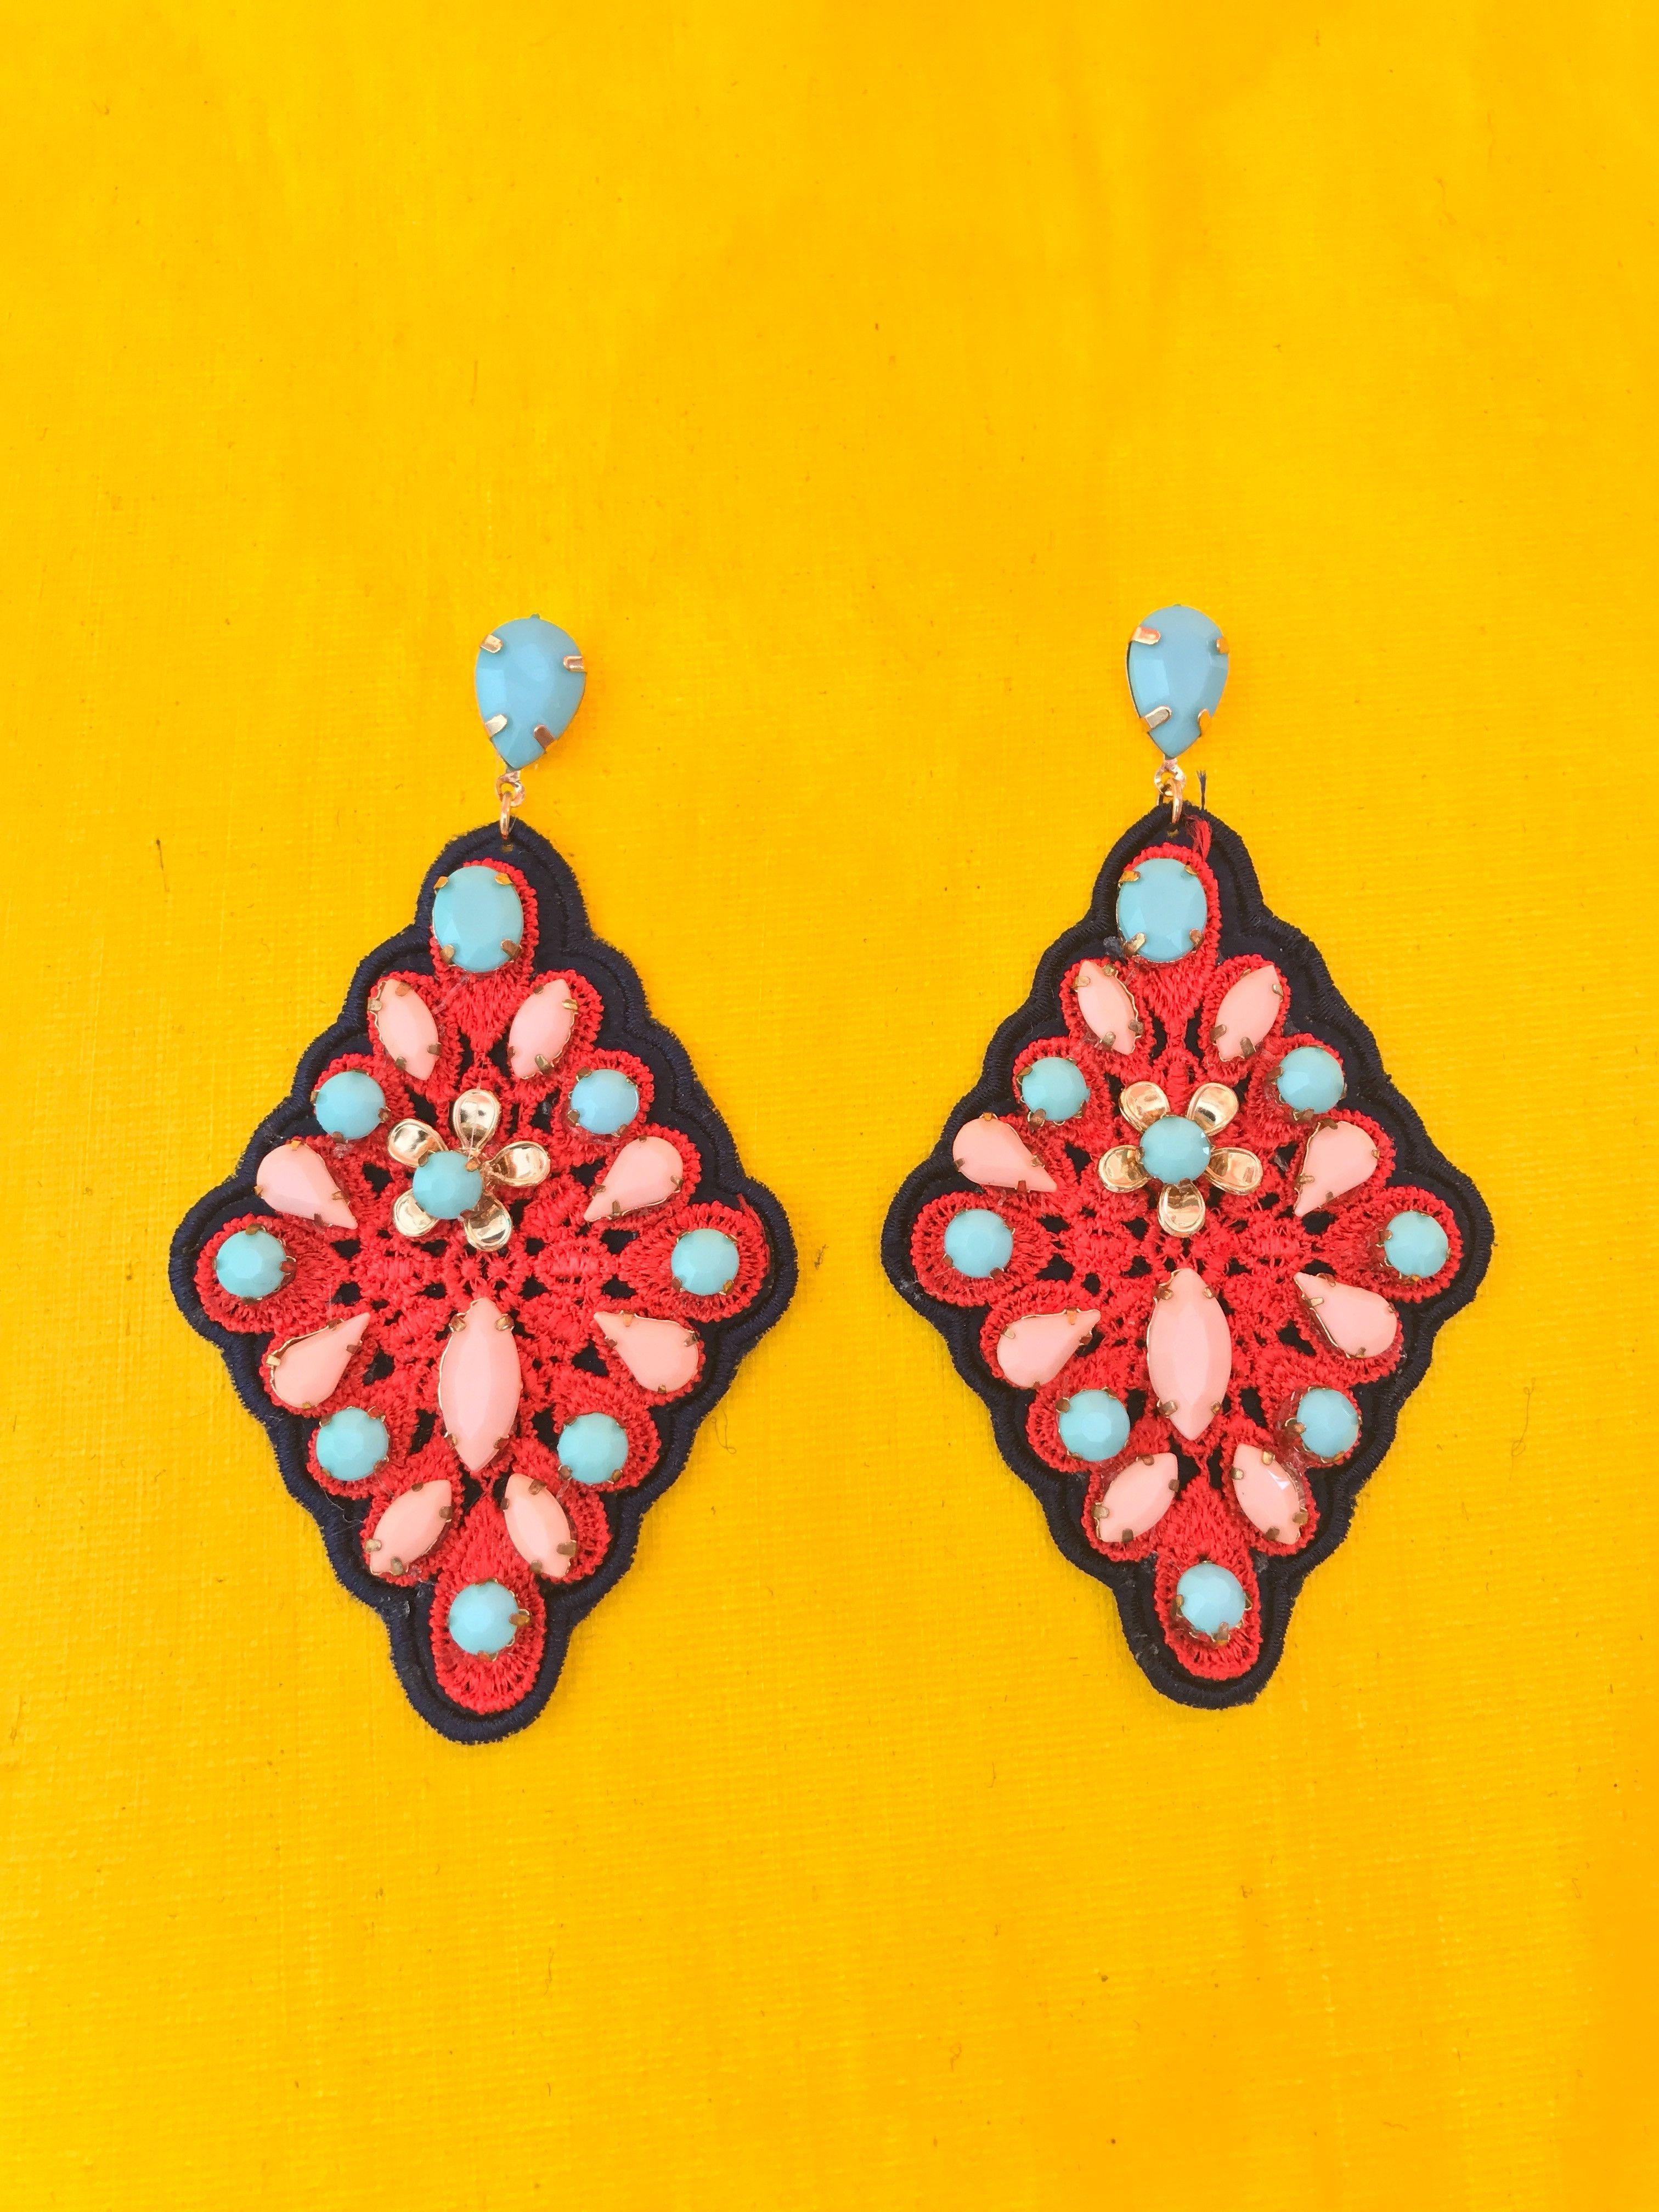 Body piercing earrings  Babble Earrings  Products  Pinterest  Products